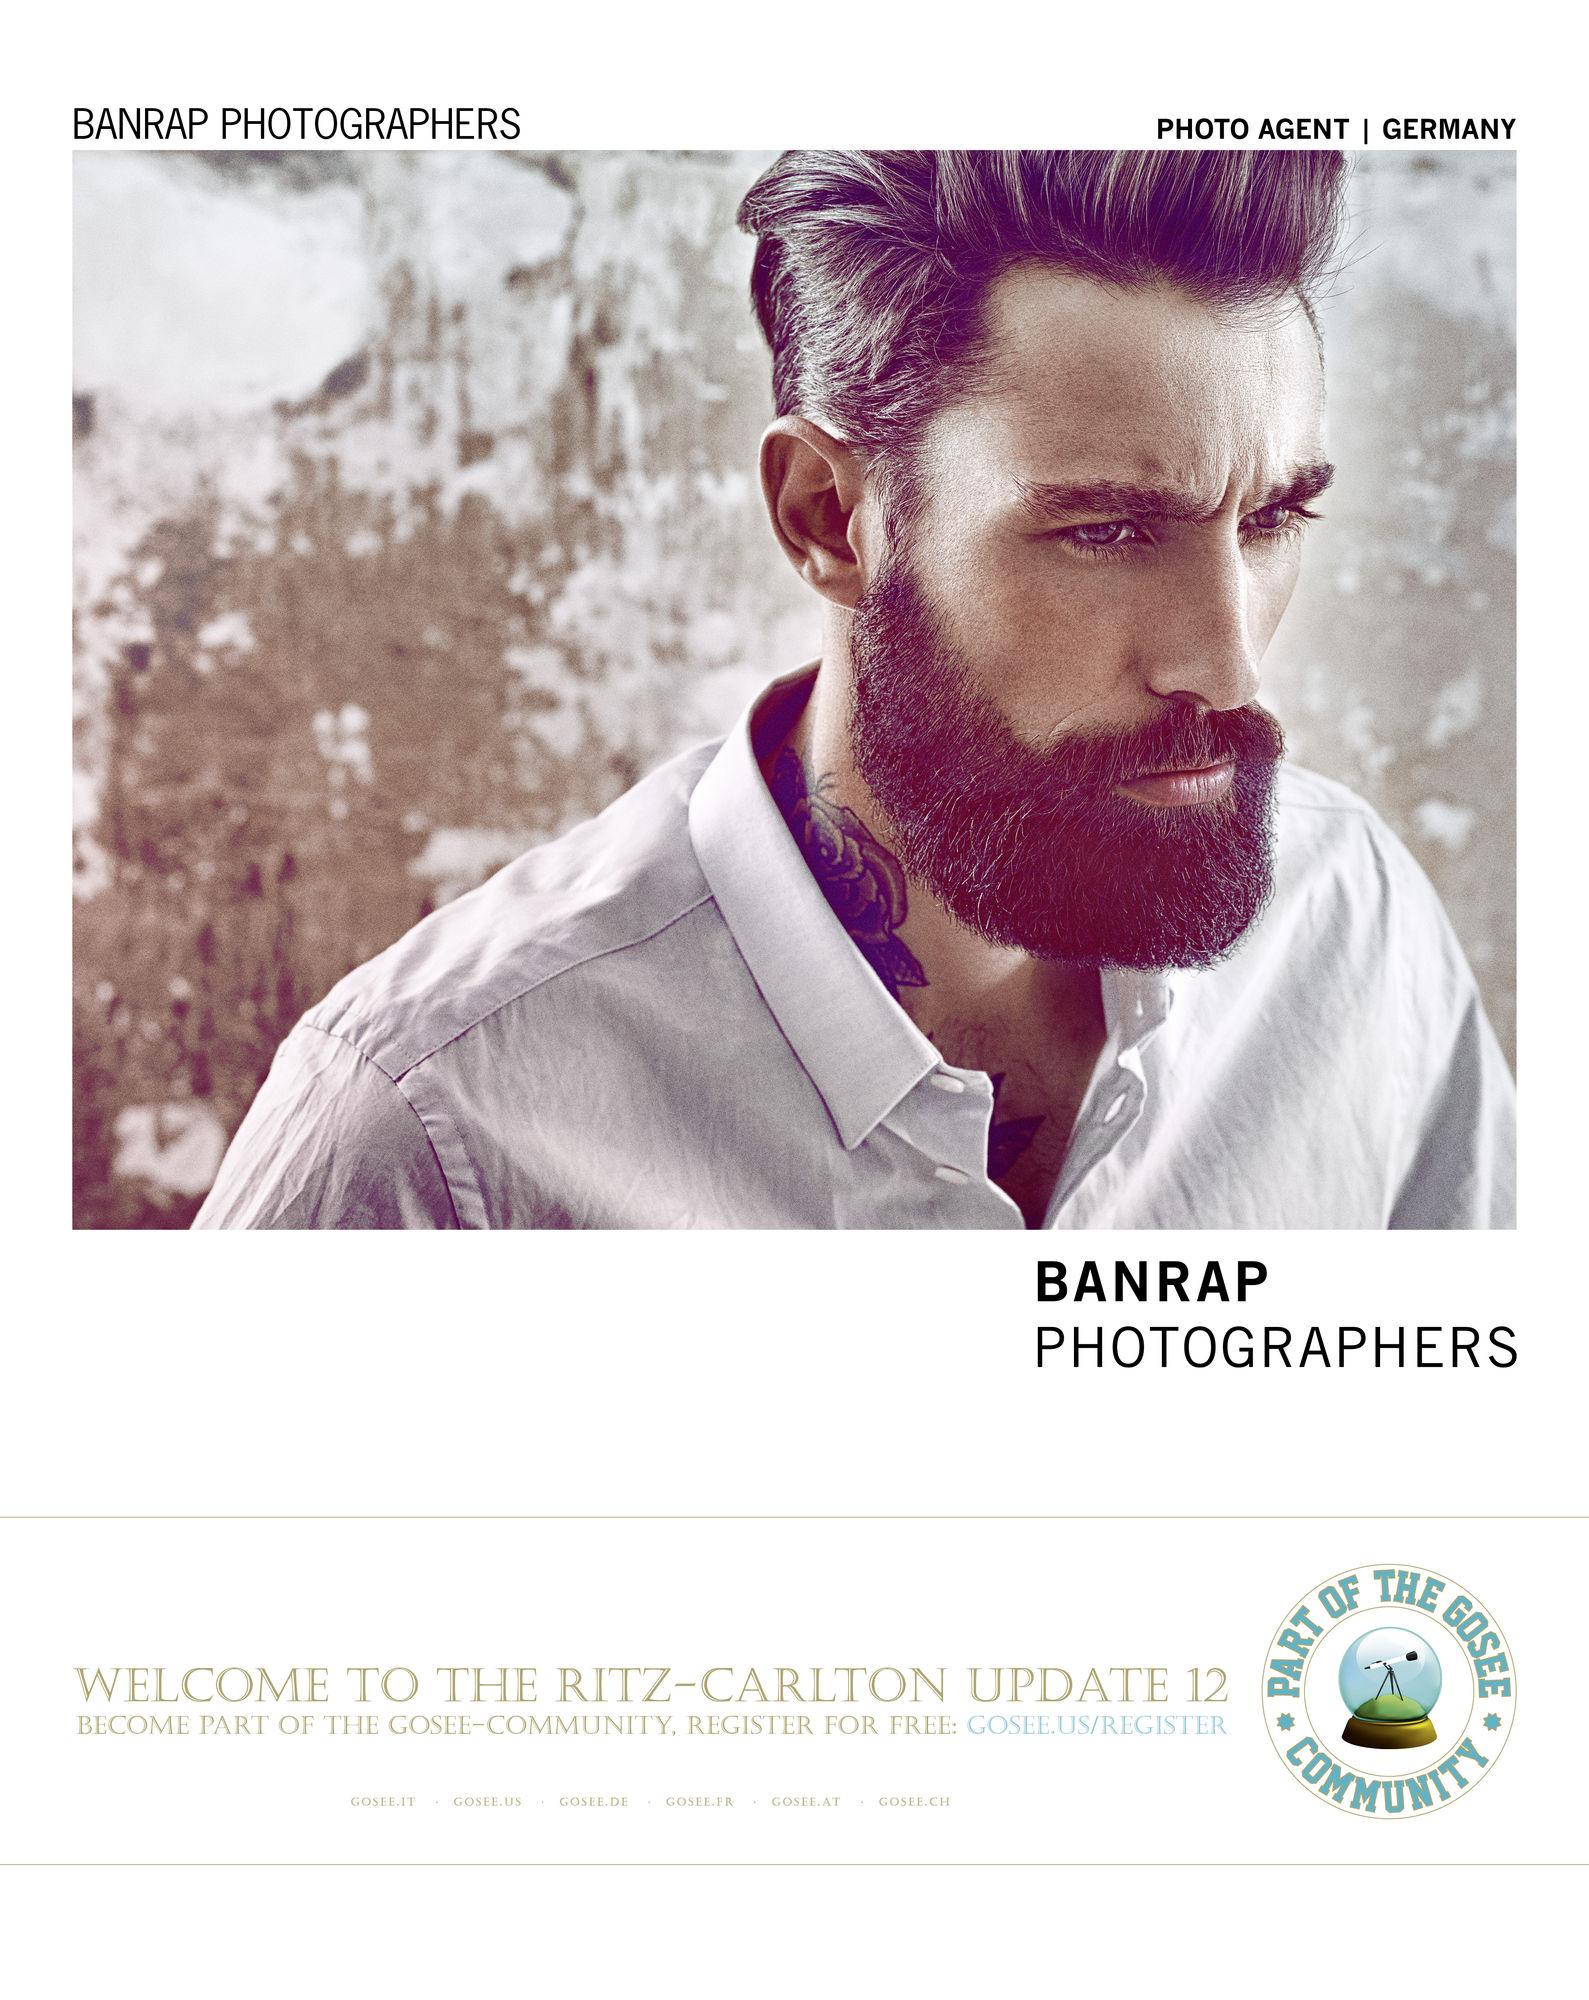 UPDATE 12 : Banrap Photographers